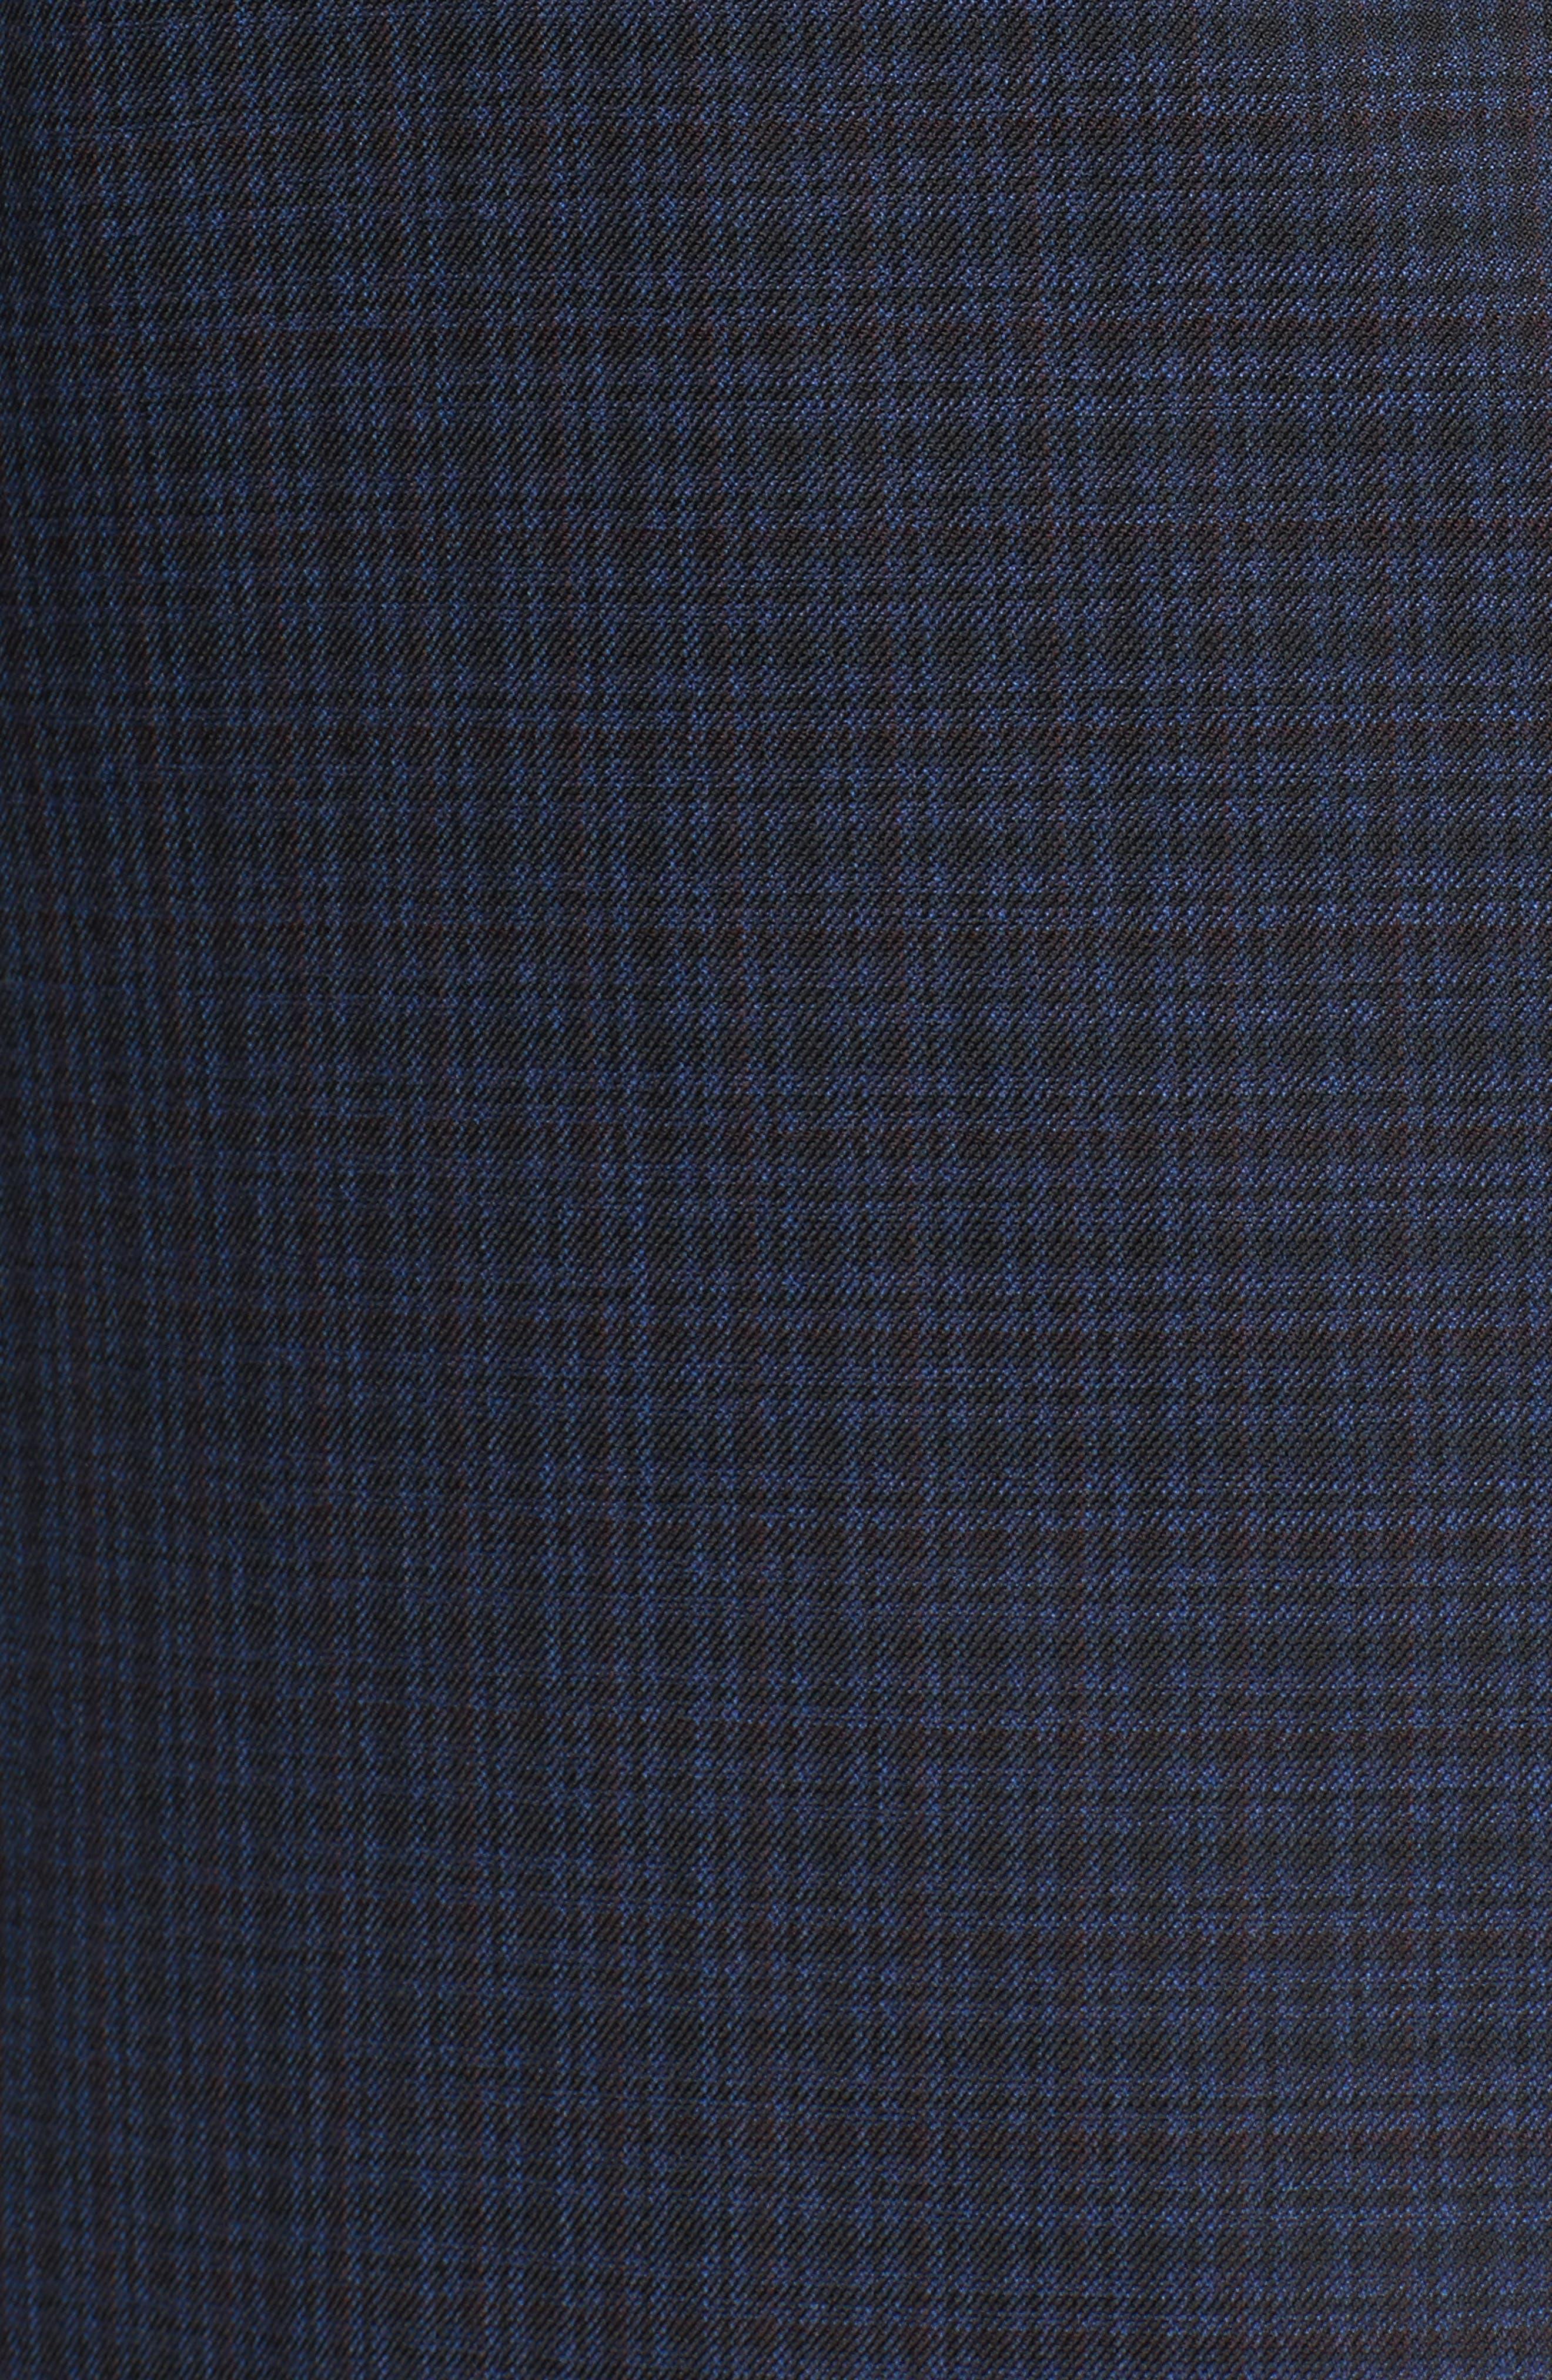 Classic B Fit Check Wool Sport Coat,                             Alternate thumbnail 5, color,                             410